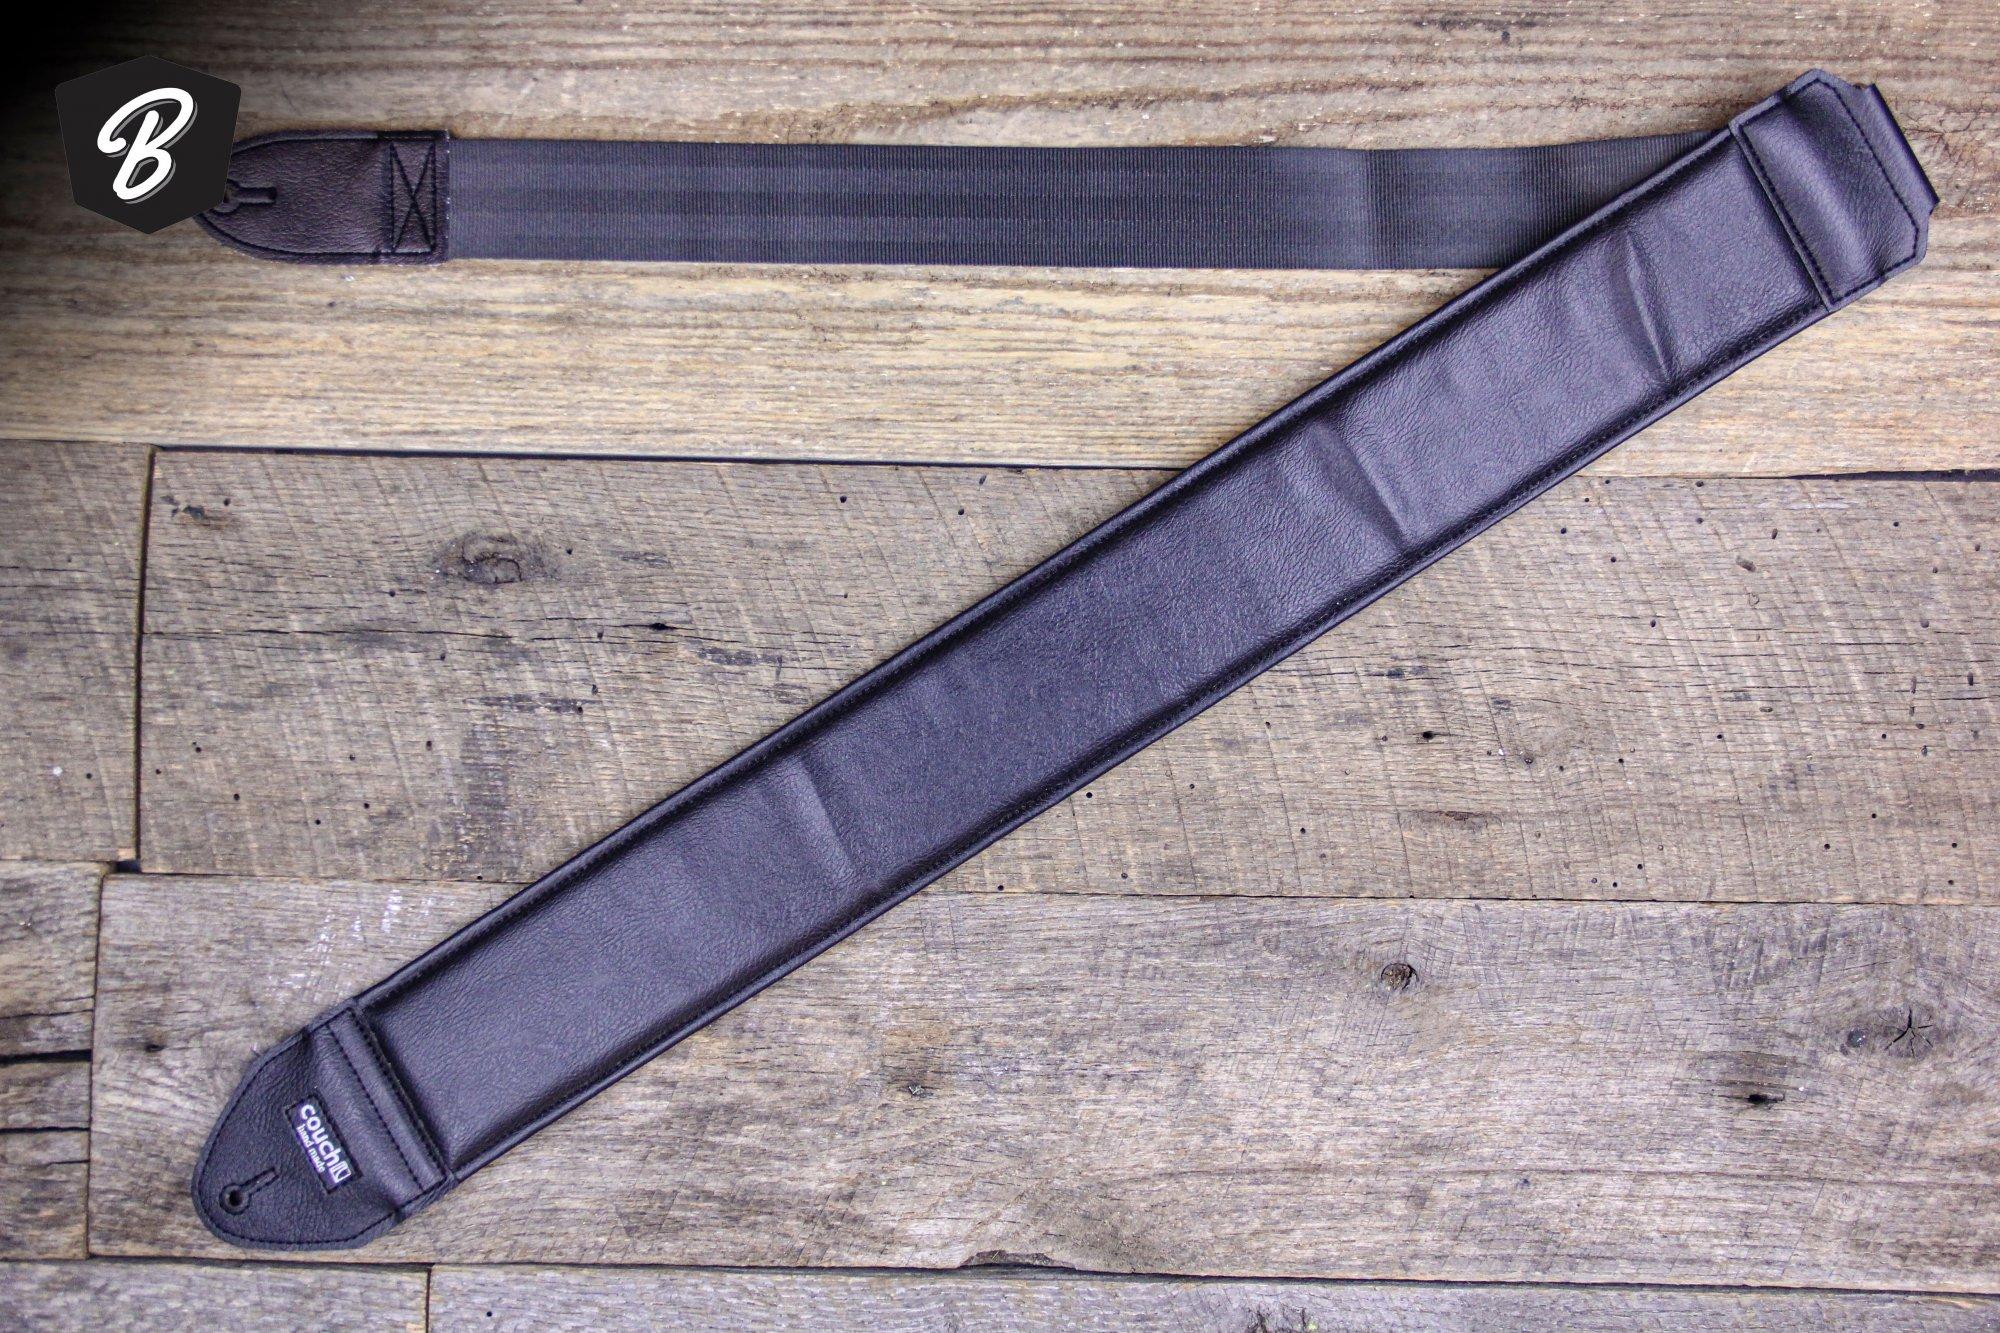 Couch 3 Black Vinyl Bass/Guitar Strap